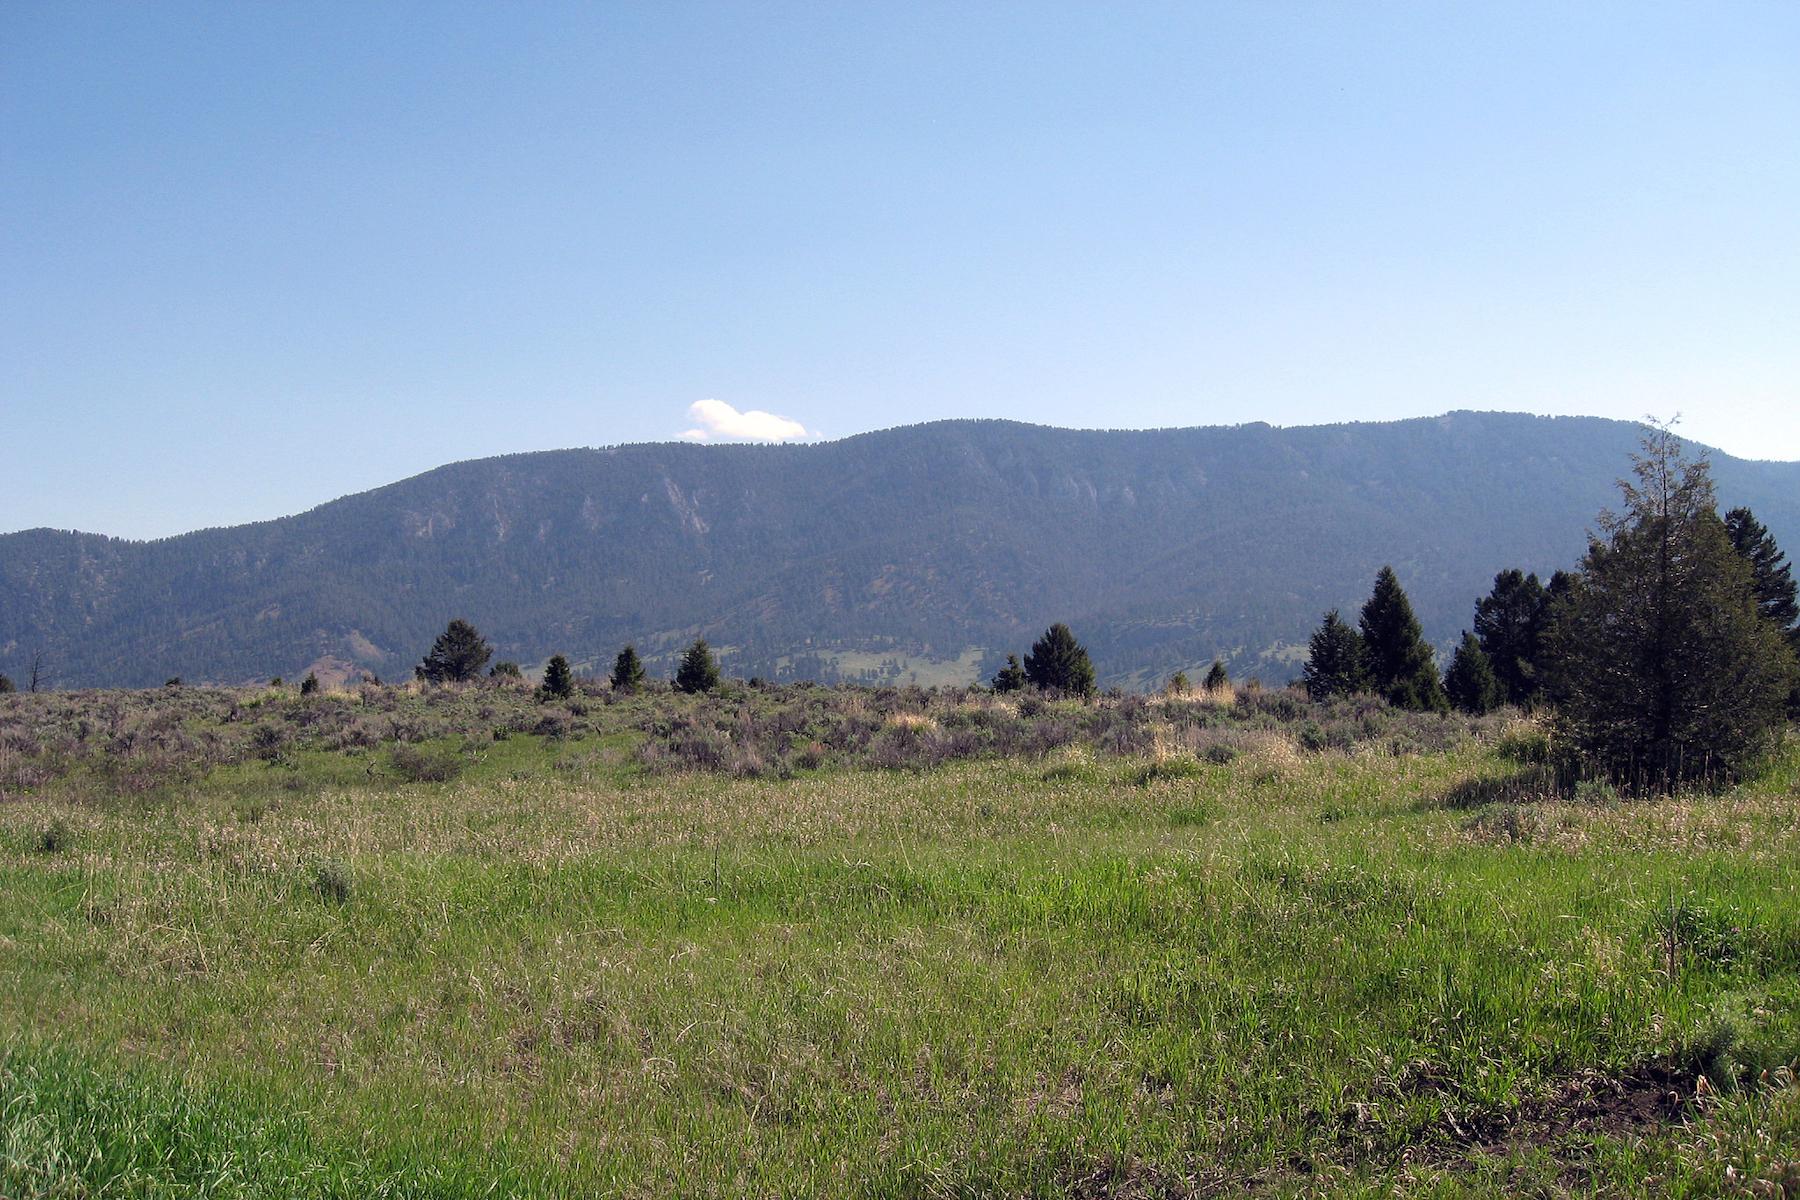 Terreno per Vendita alle ore Porcupine Park Homesite Talus Trail, Porcupine Park Lot 35 Big Sky, Montana, 59716 Stati Uniti